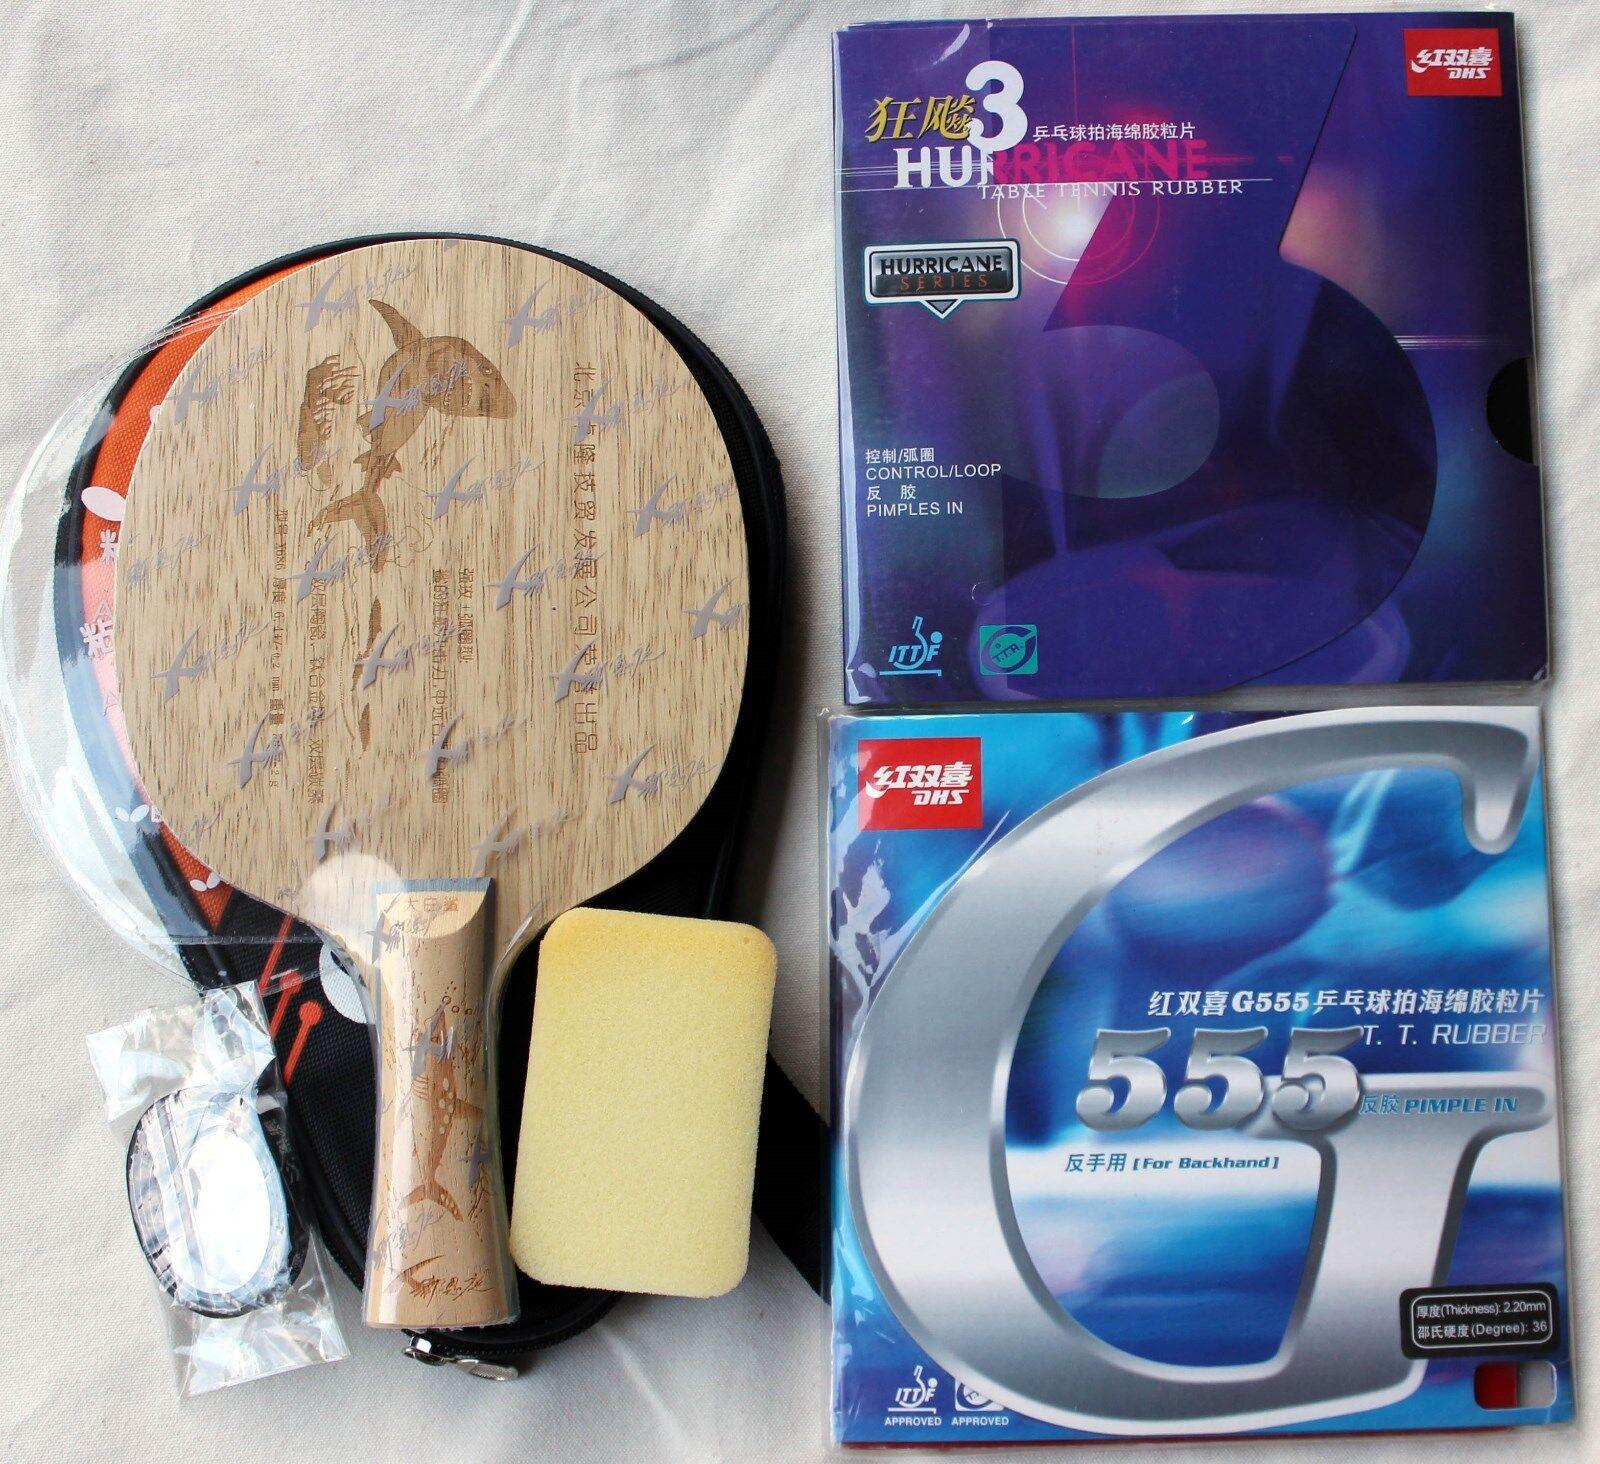 Shark 686 + Hurrican3   G555  Ti+Carbon+Ceramic Offensive Bat Case 3Star Balls,